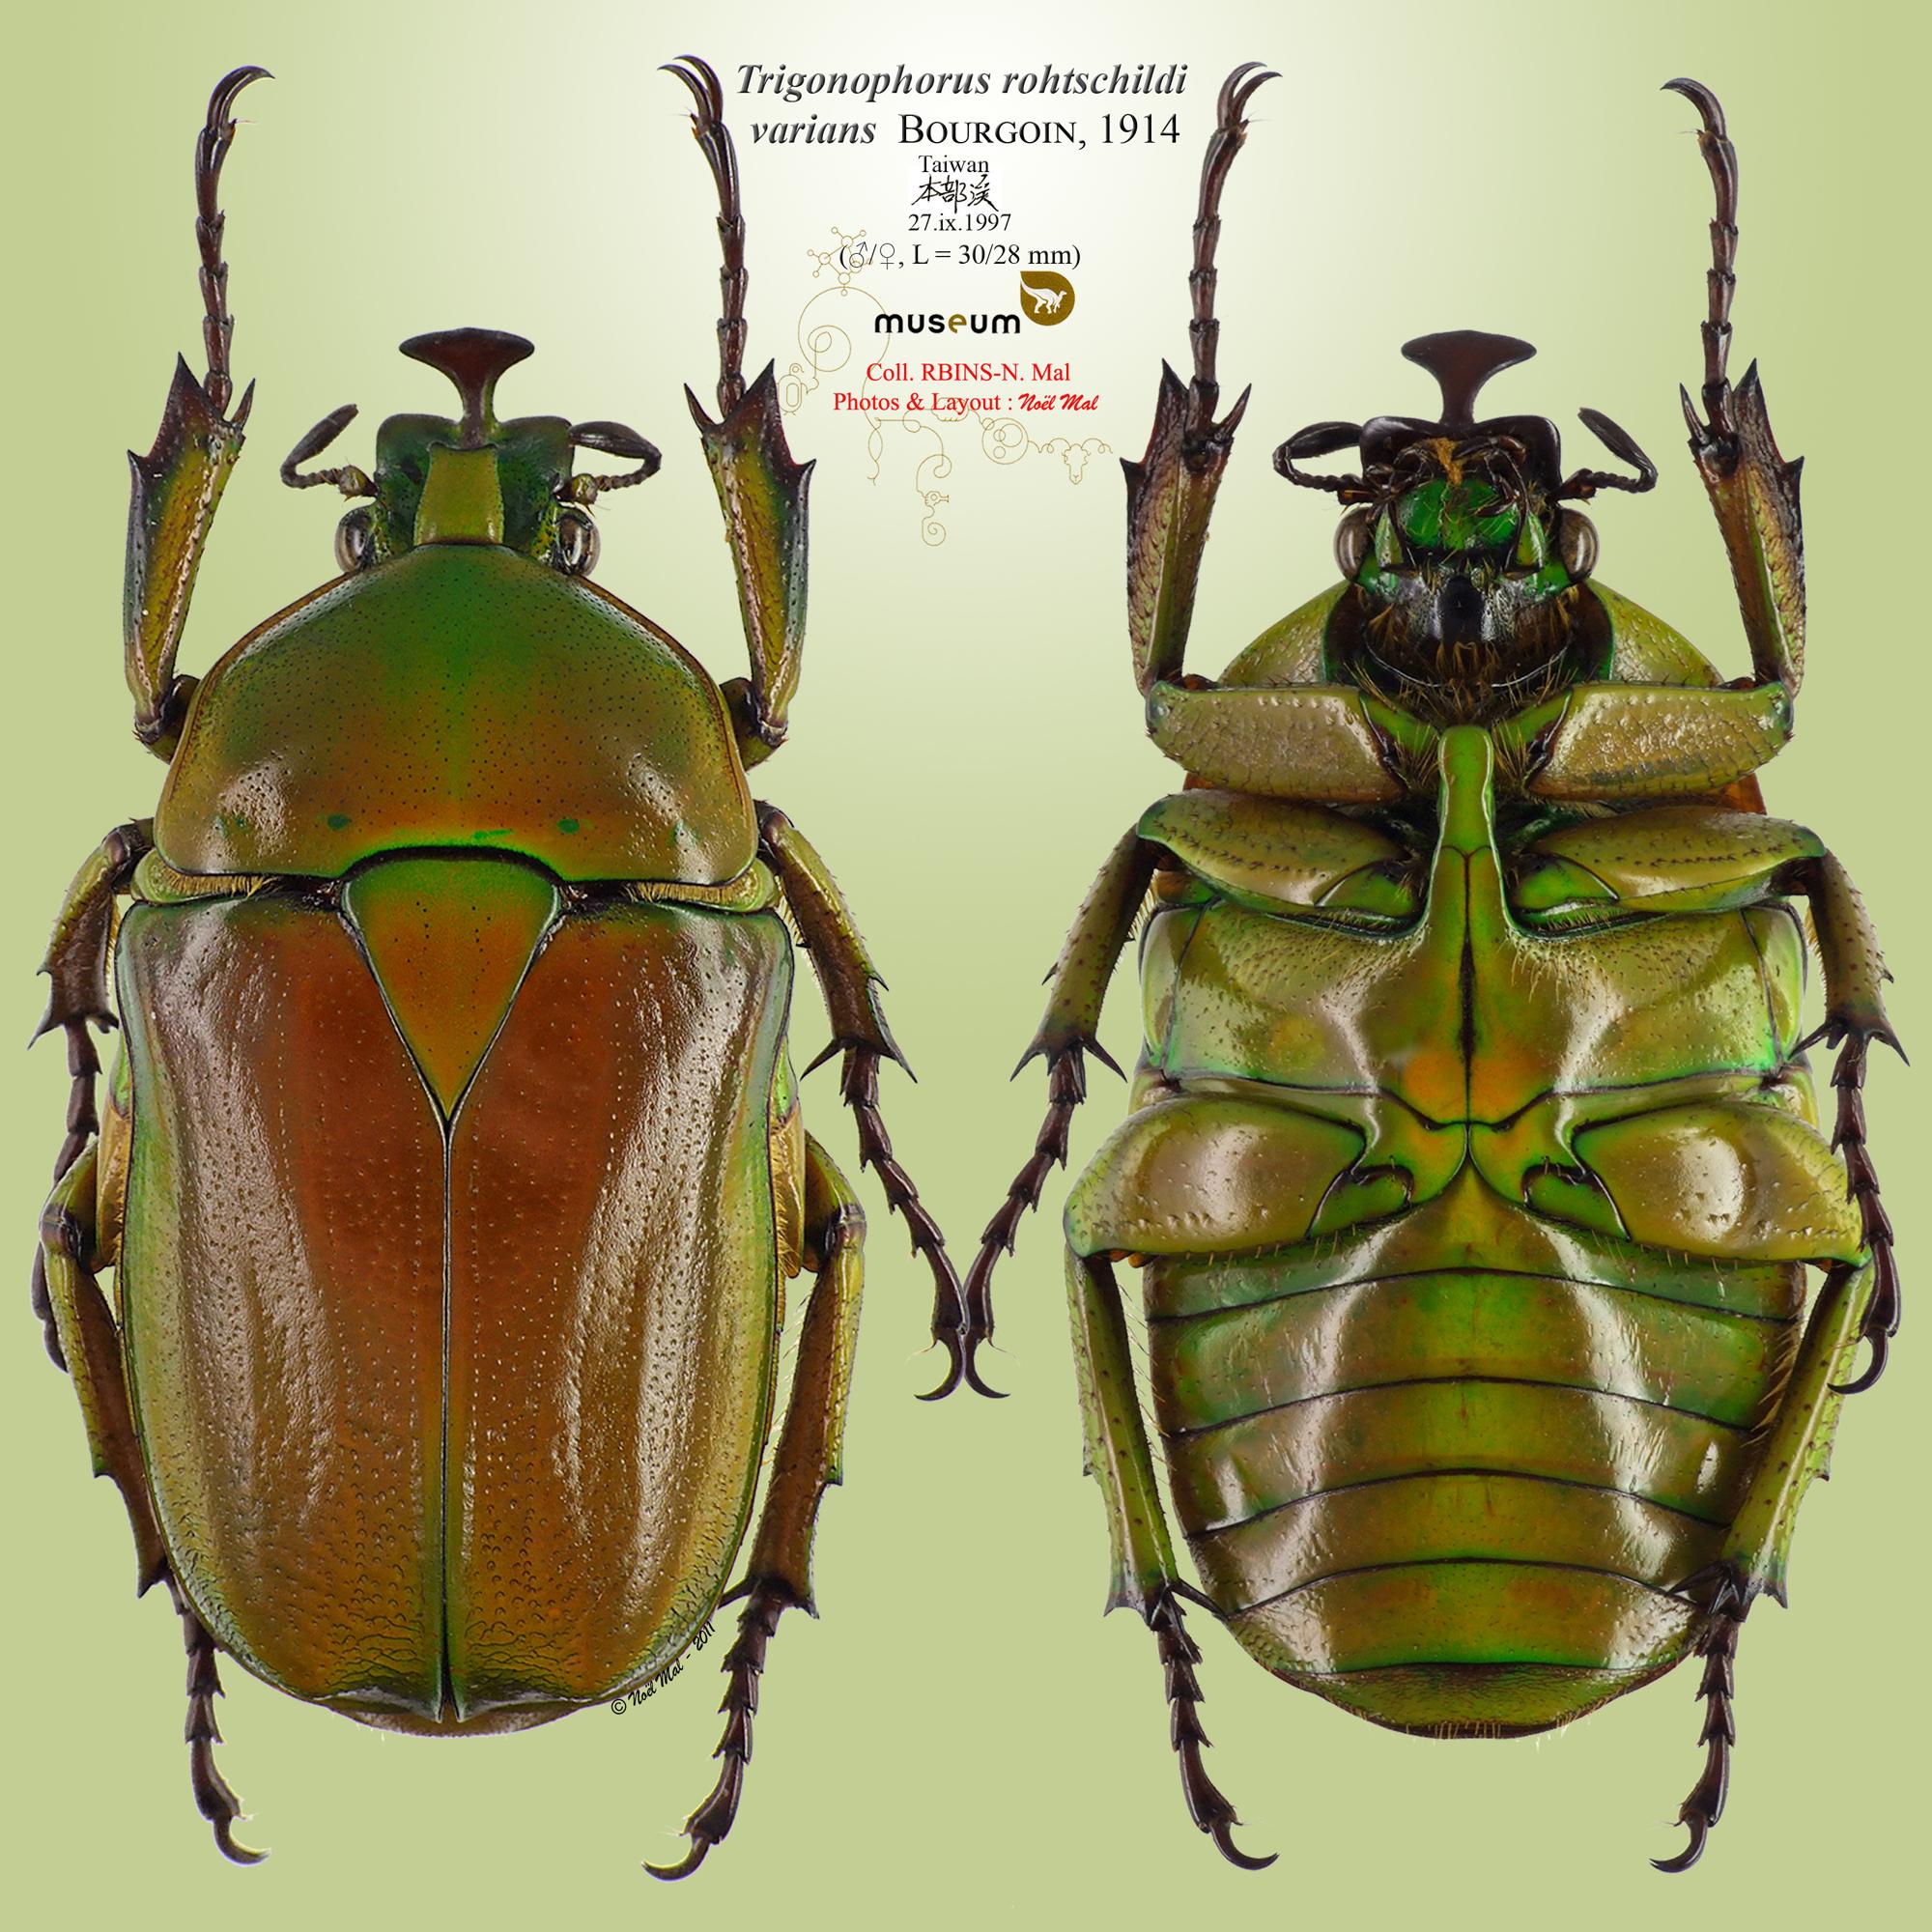 Trigonophorus rotschildi varians r2.jpg